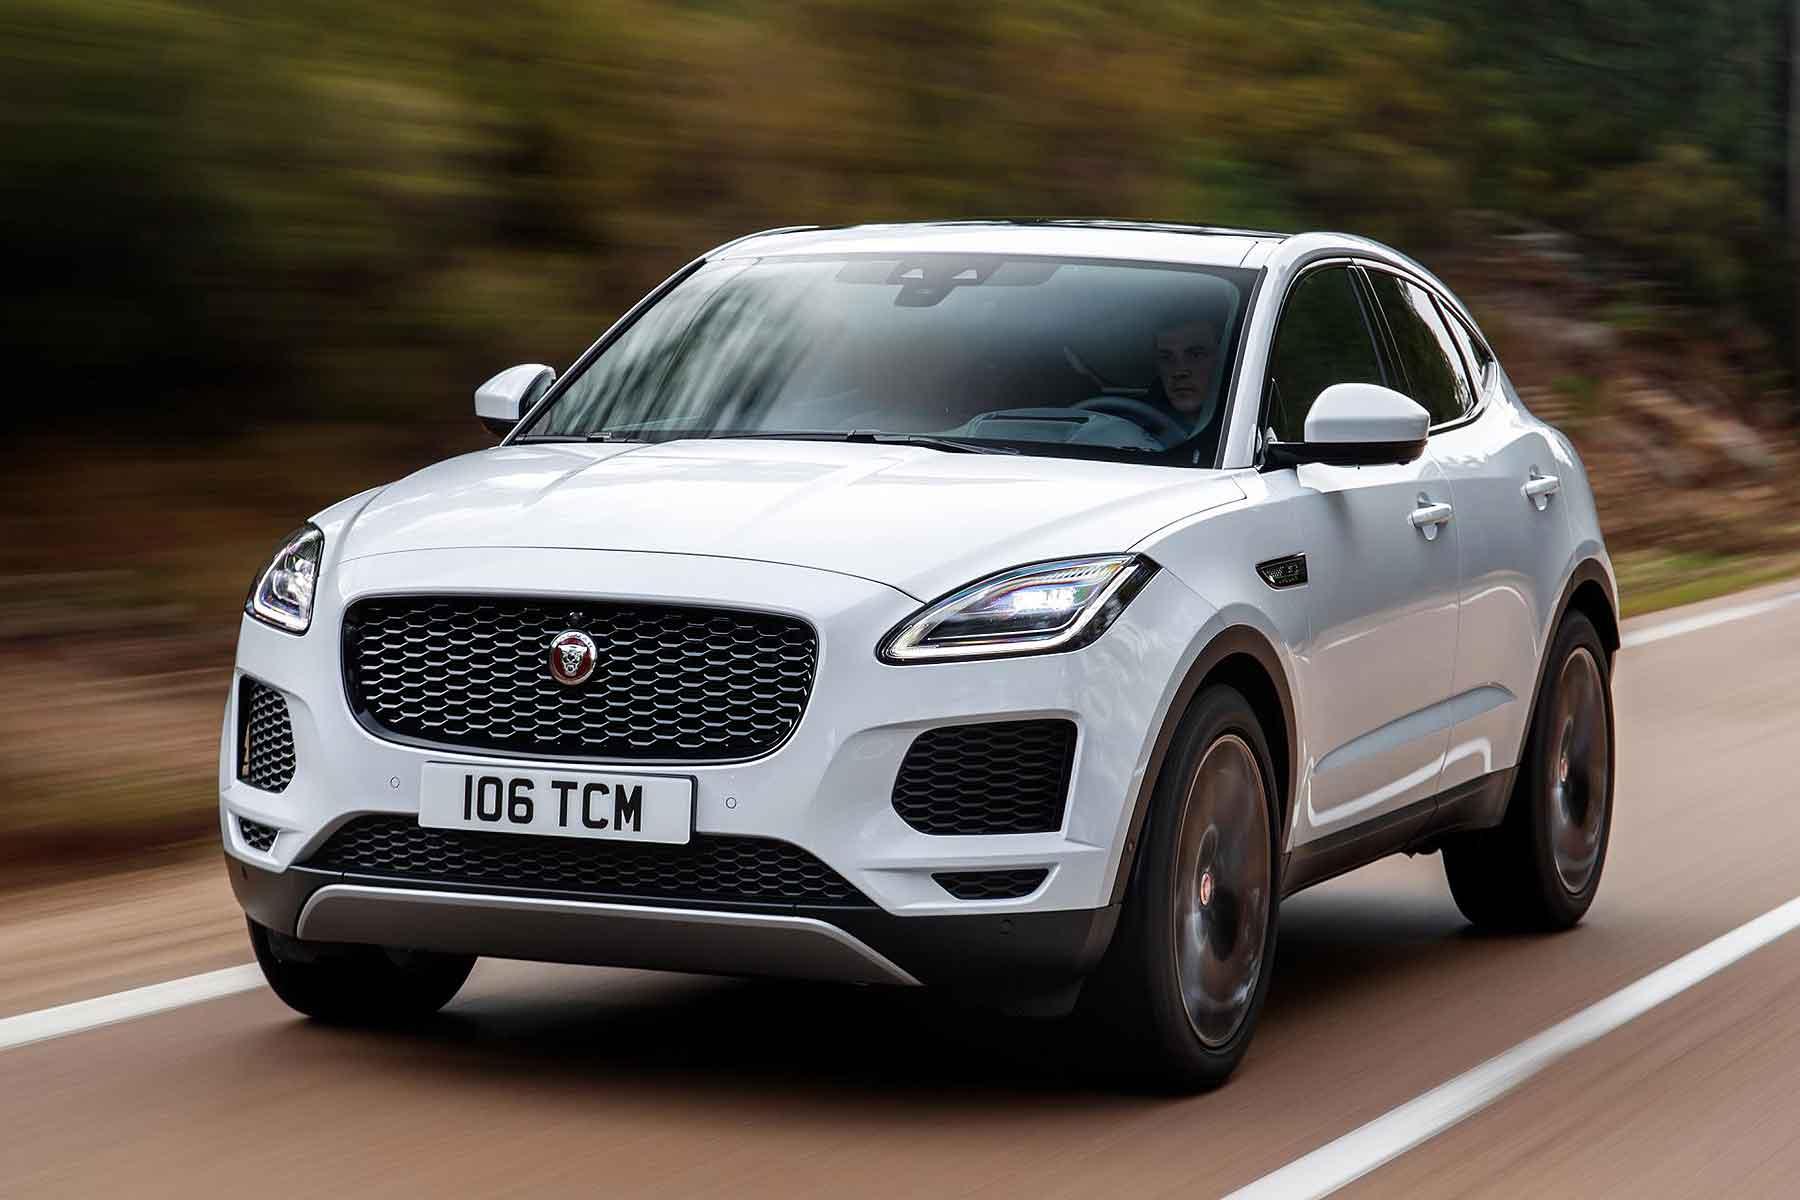 Jaguar E-Pace 2018 tech update